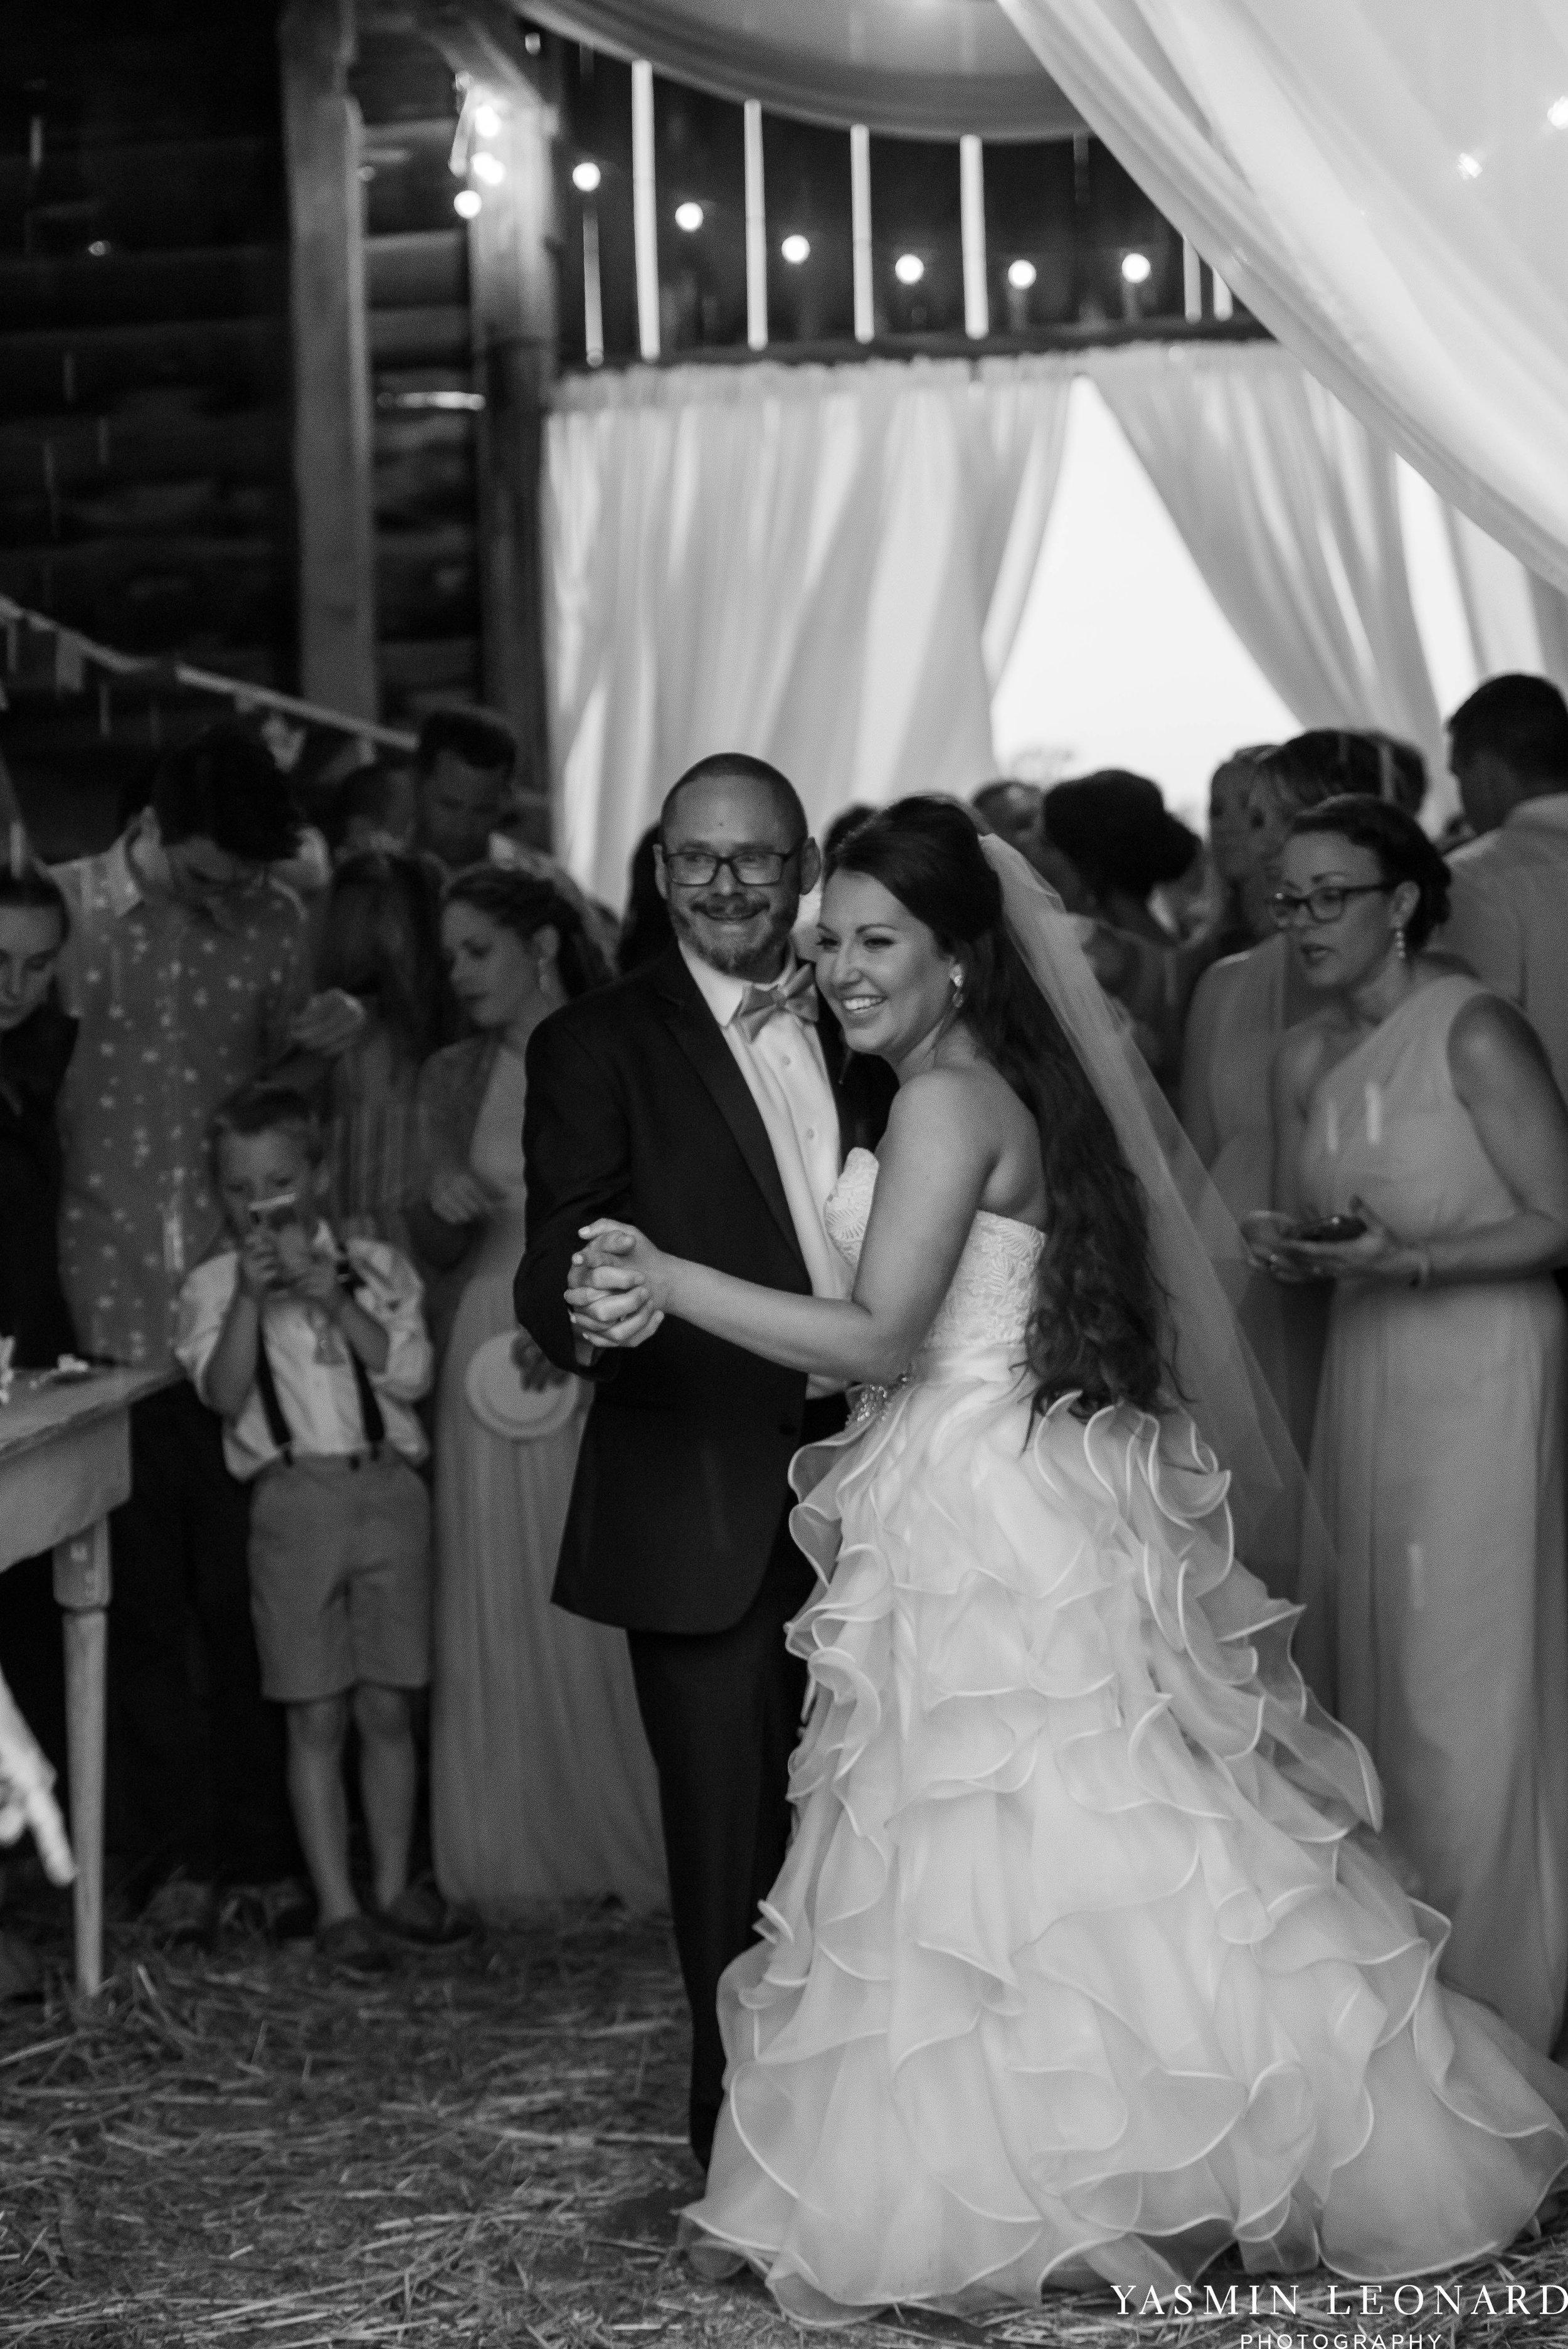 Rain on your wedding day - Rainy Wedding - Plan B for Rain - What to do if it rains on your wedding day - Wedding Inspiration - Outdoor wedding ideas - Rainy Wedding Pictures - Yasmin Leonard Photography-74.jpg